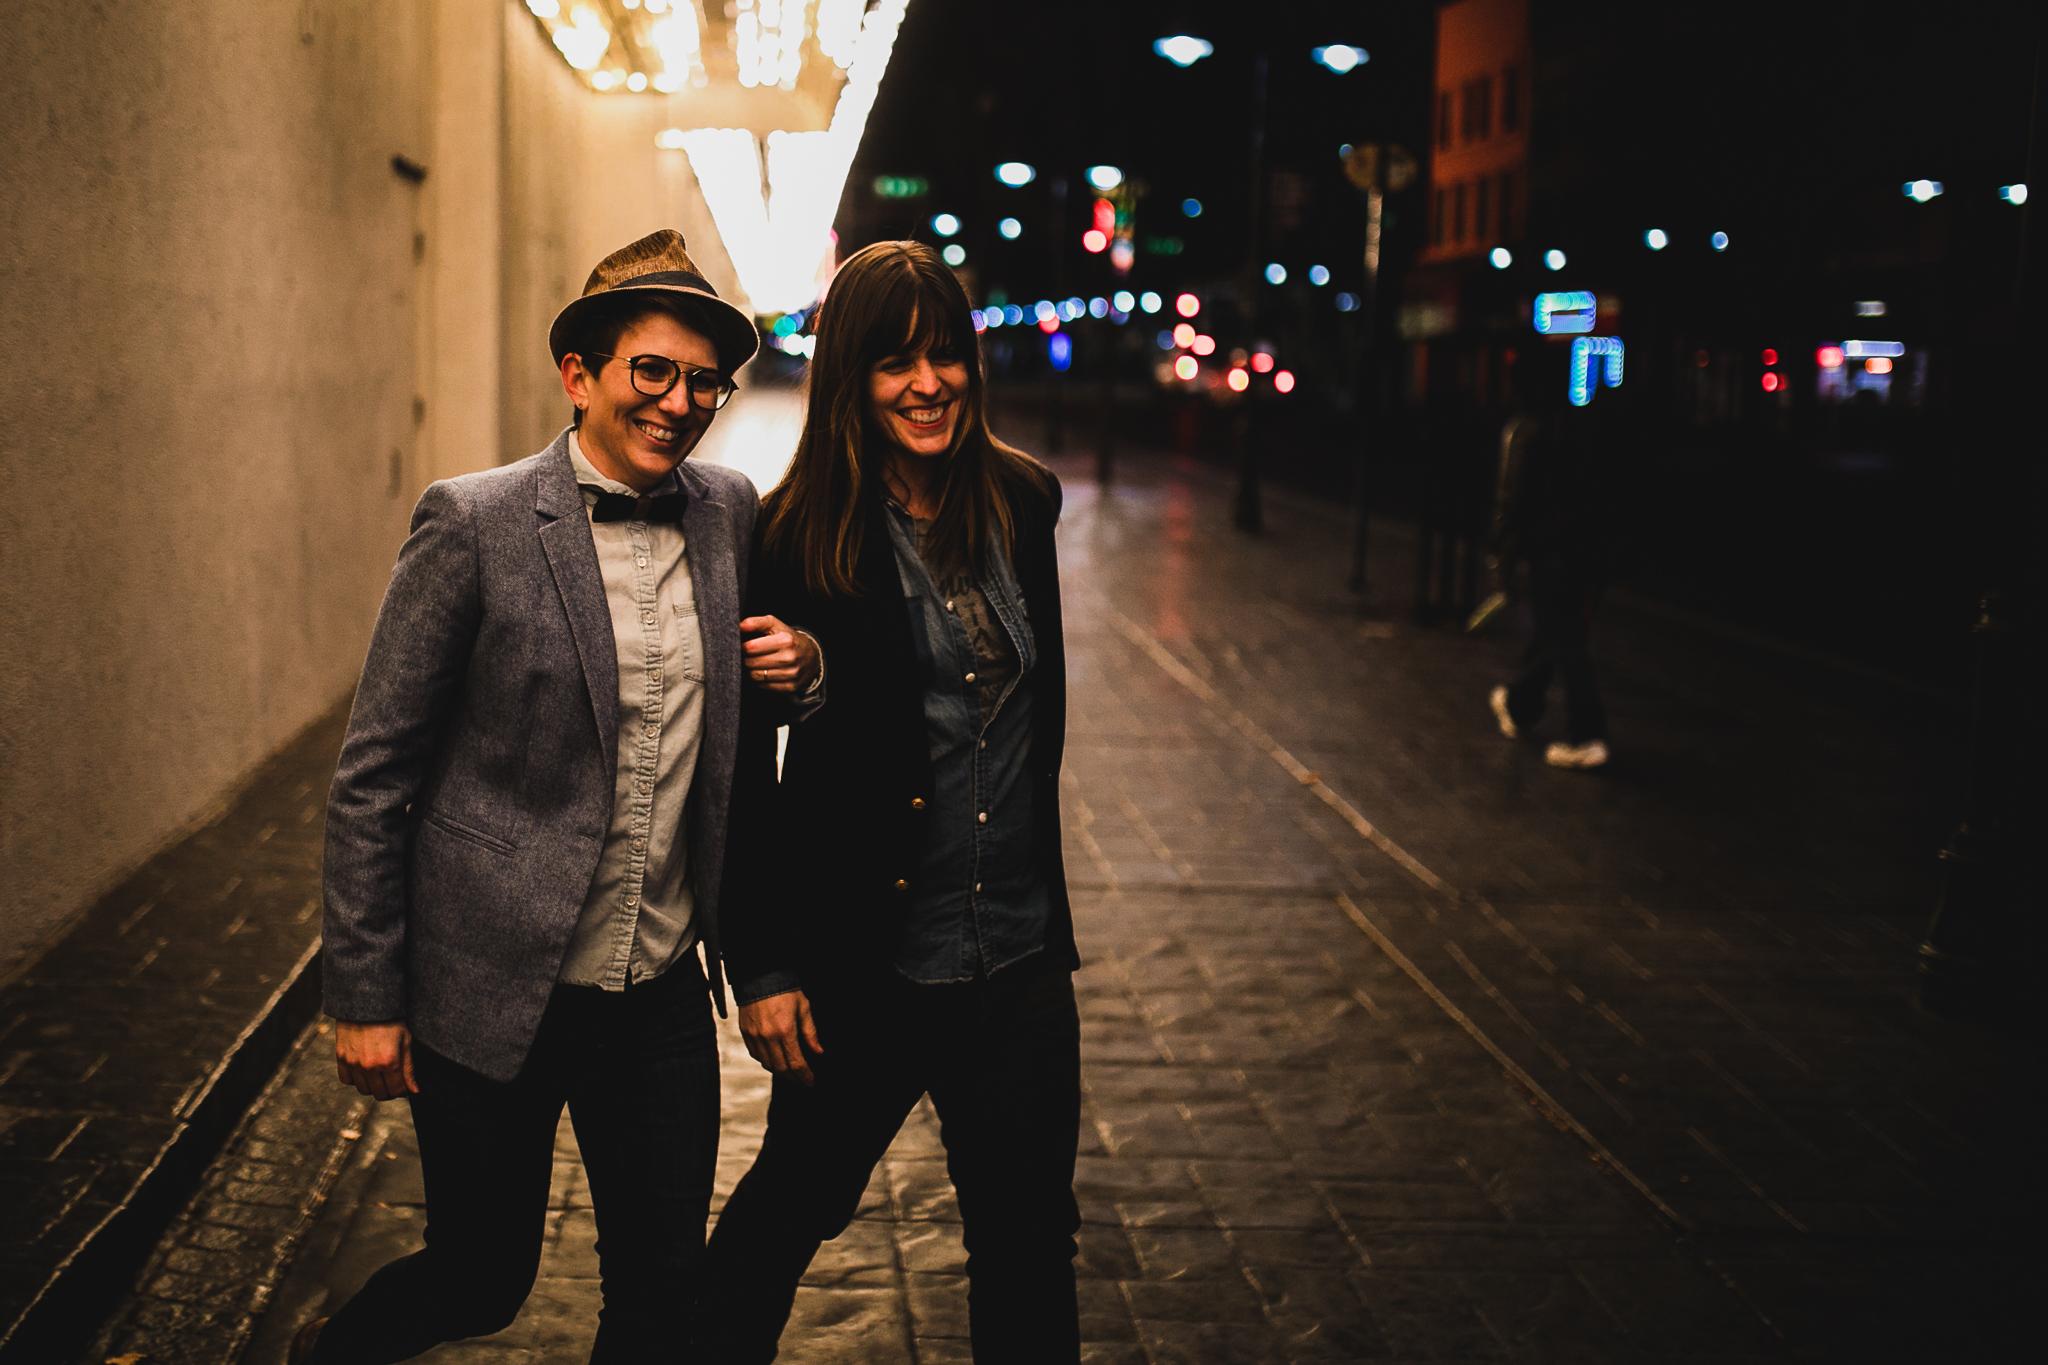 Archer Inspired Photography Hilary and Gia LGTBQ Reno Nevada Couple Wedding Engagement Photographer-20.jpg